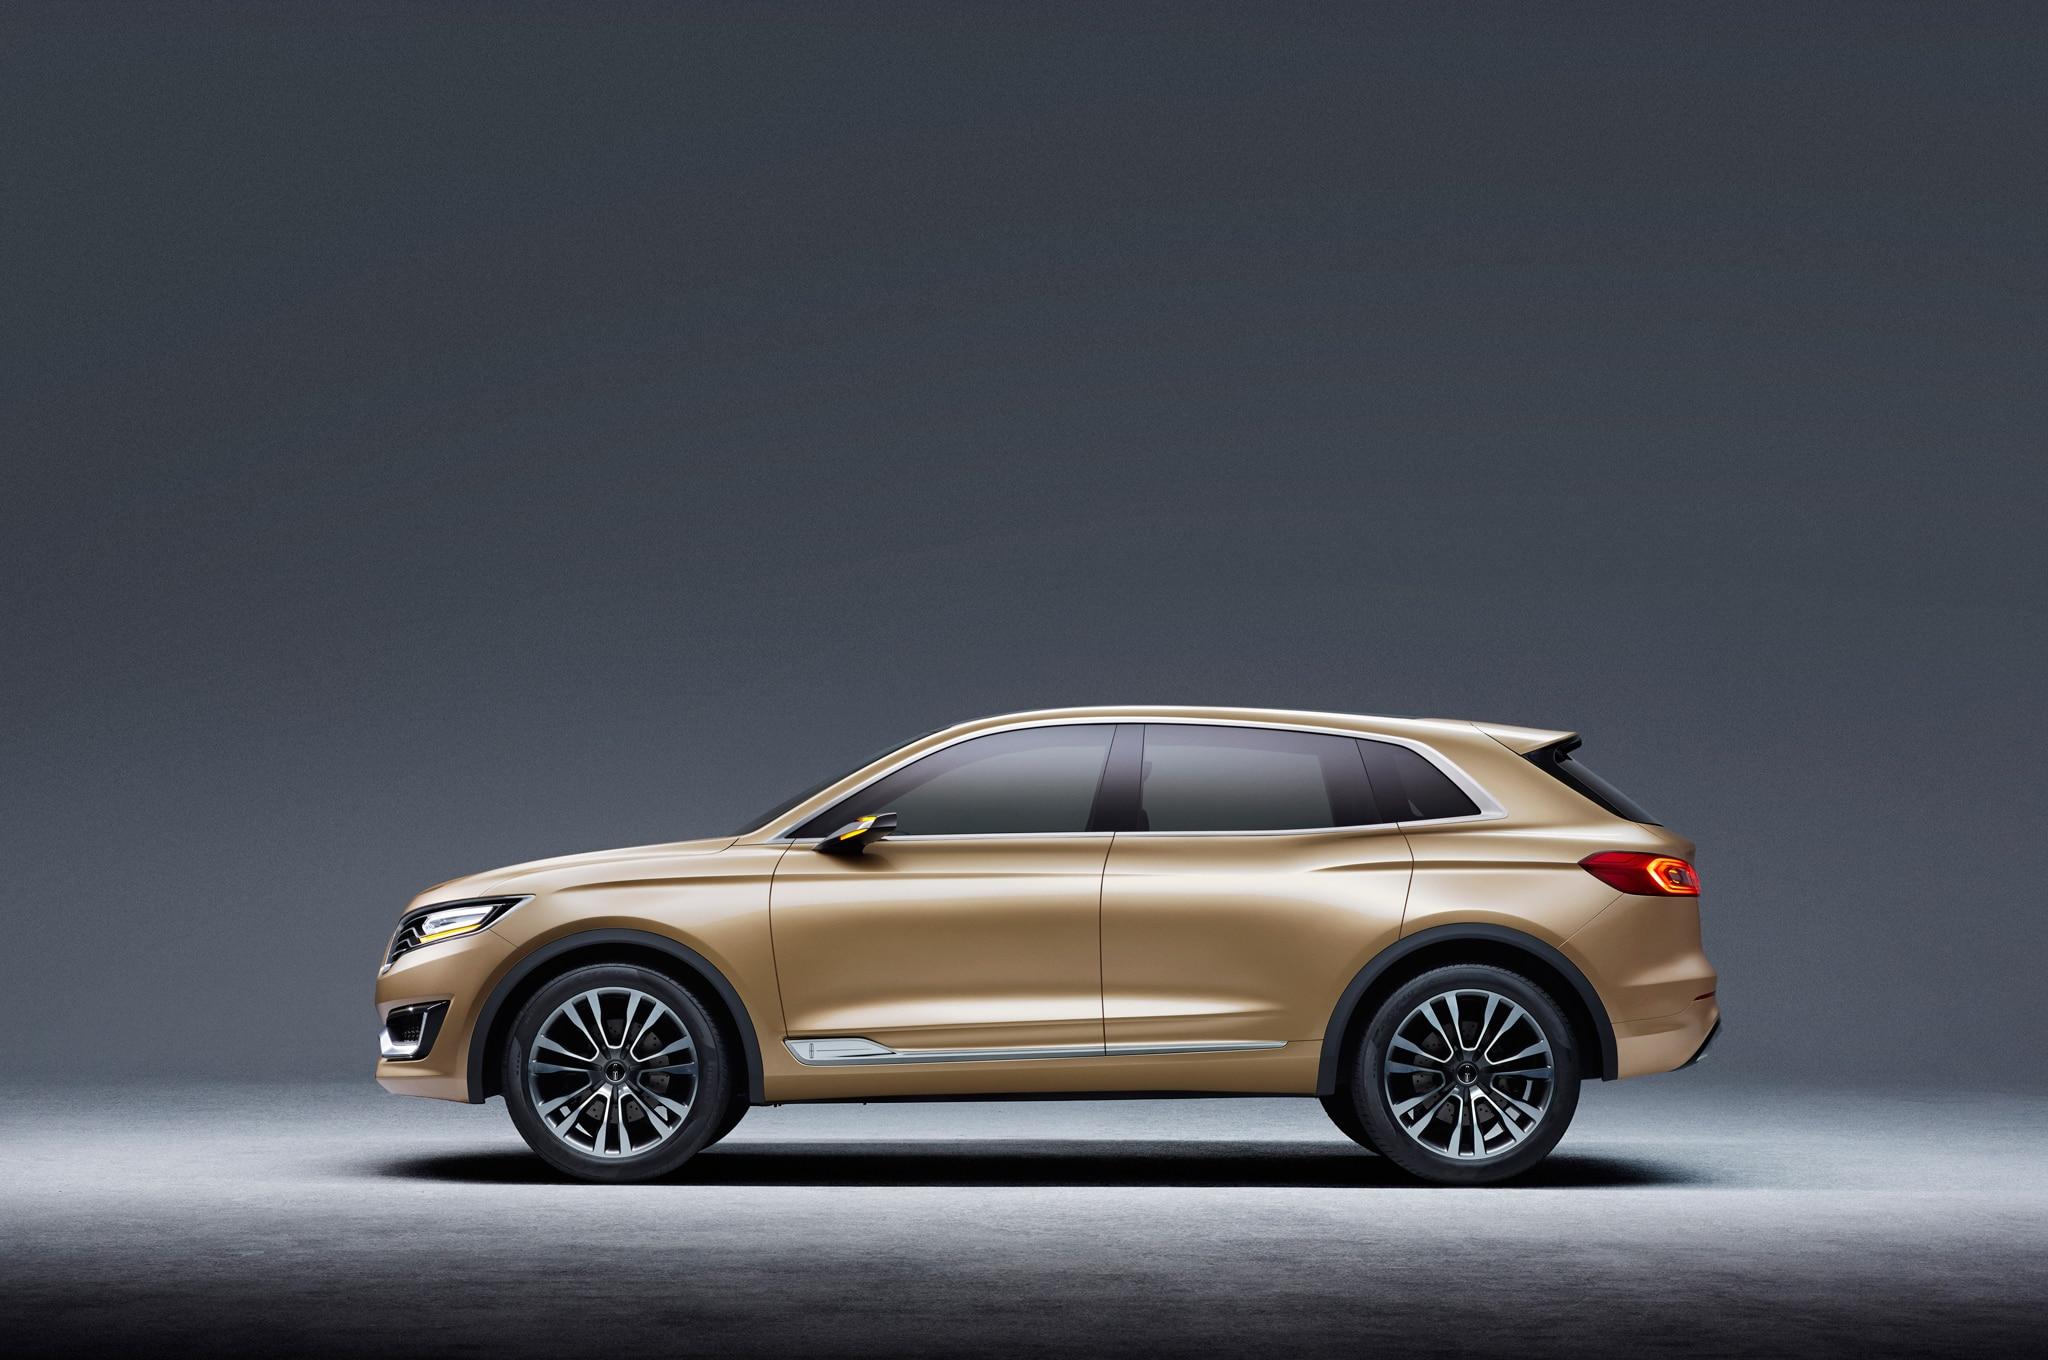 http://st.automobilemag.com/uploads/sites/11/2014/04/Lincoln-MKX-Concept-side-profile-02.jpg